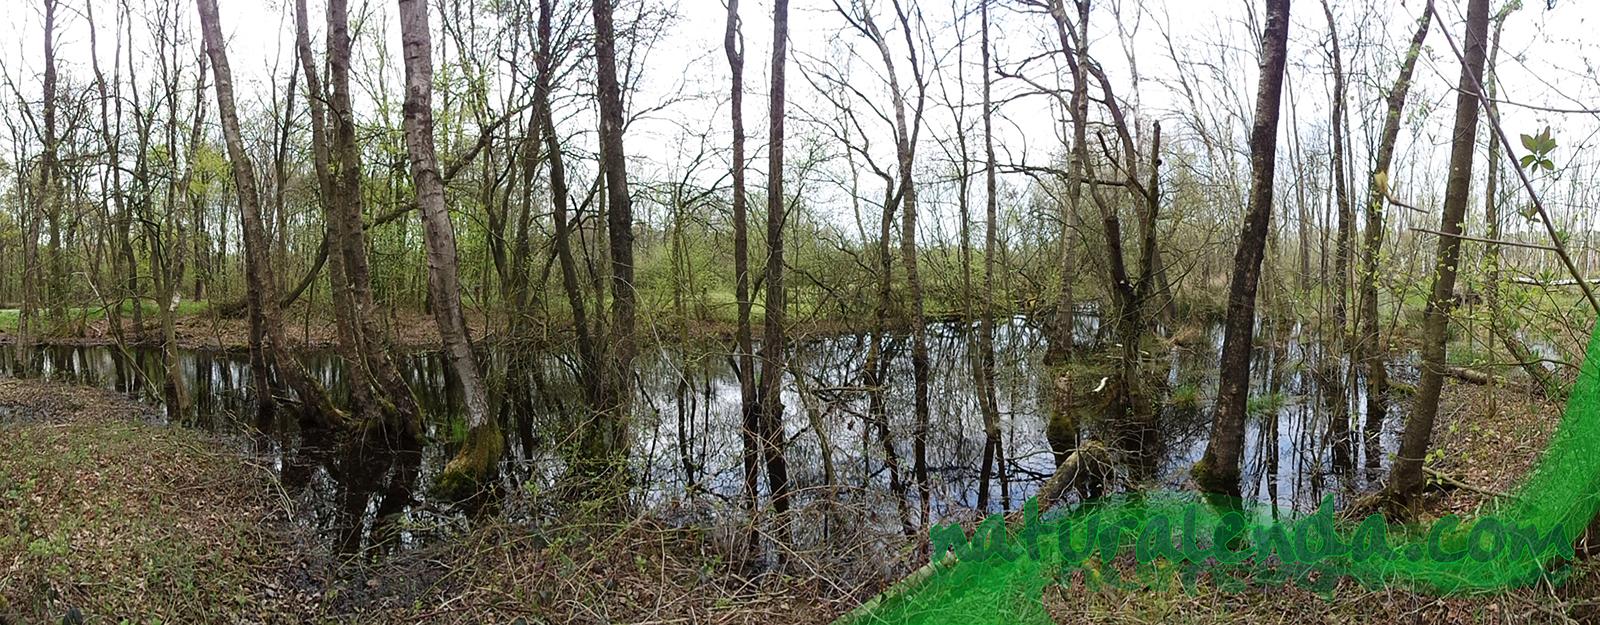 panoramica 1 del pantano con arboles